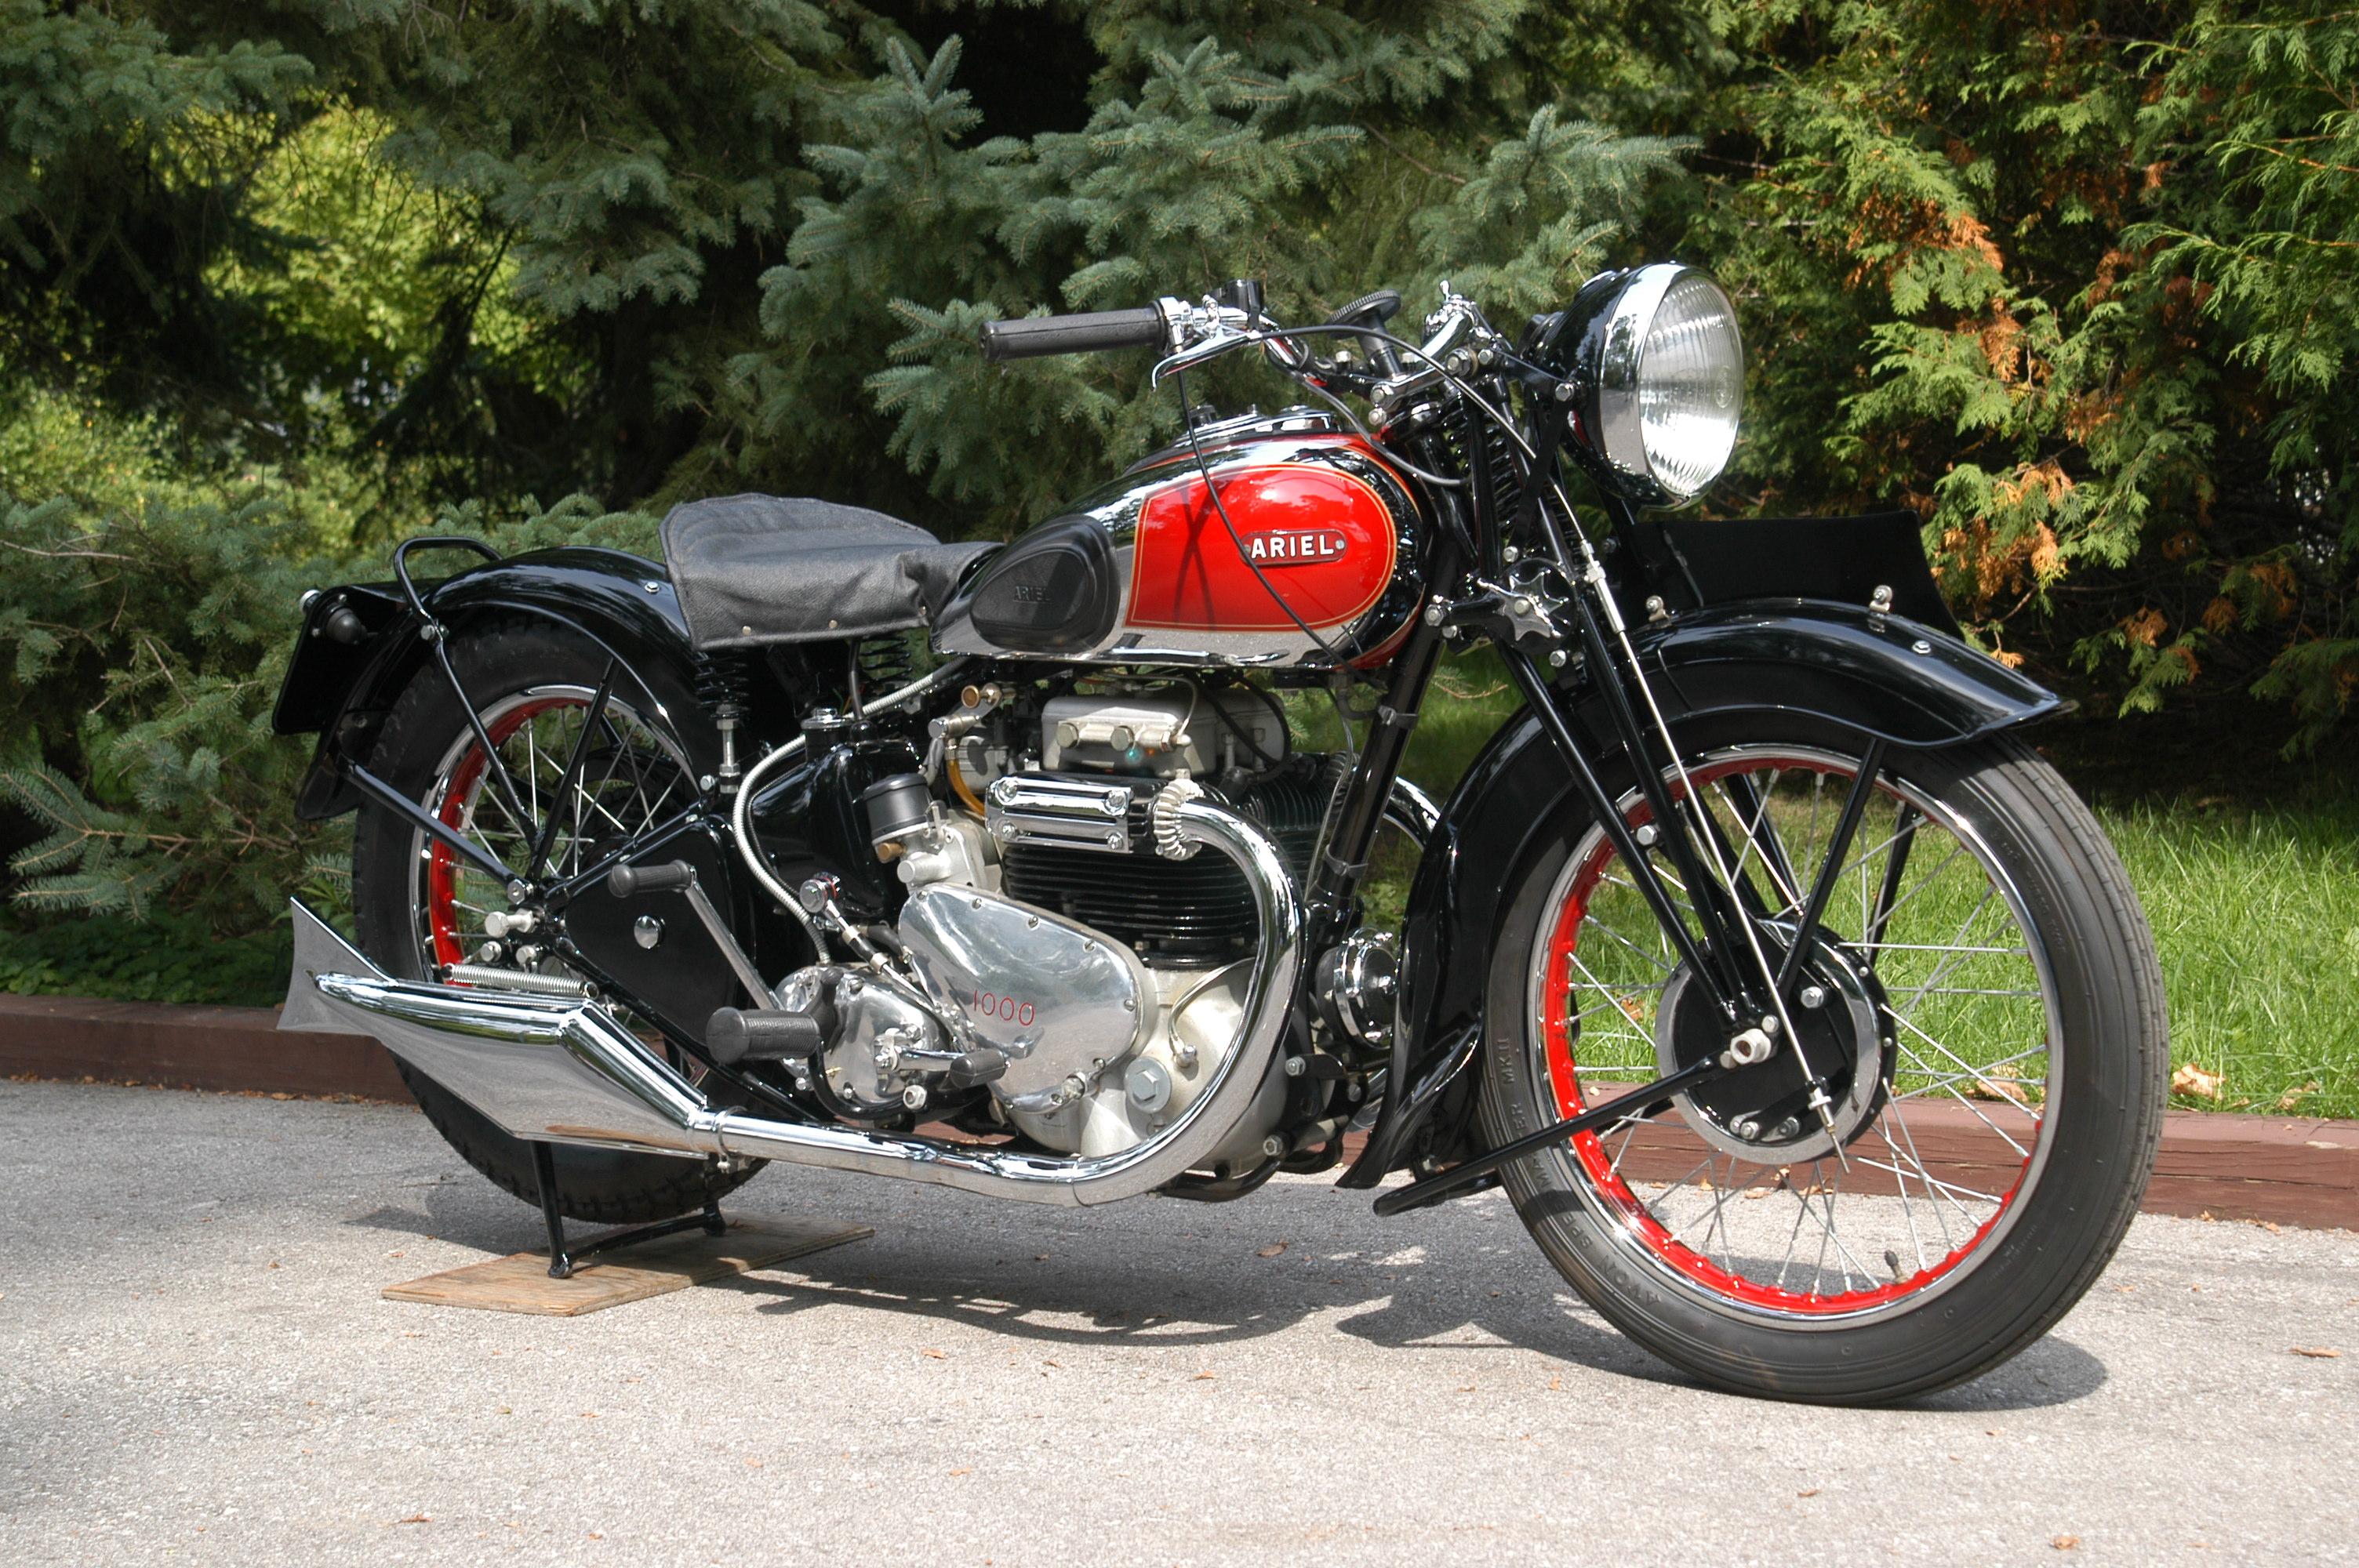 Ariel 1938 NG 350cc 1 cyl ohv - Yesterdays